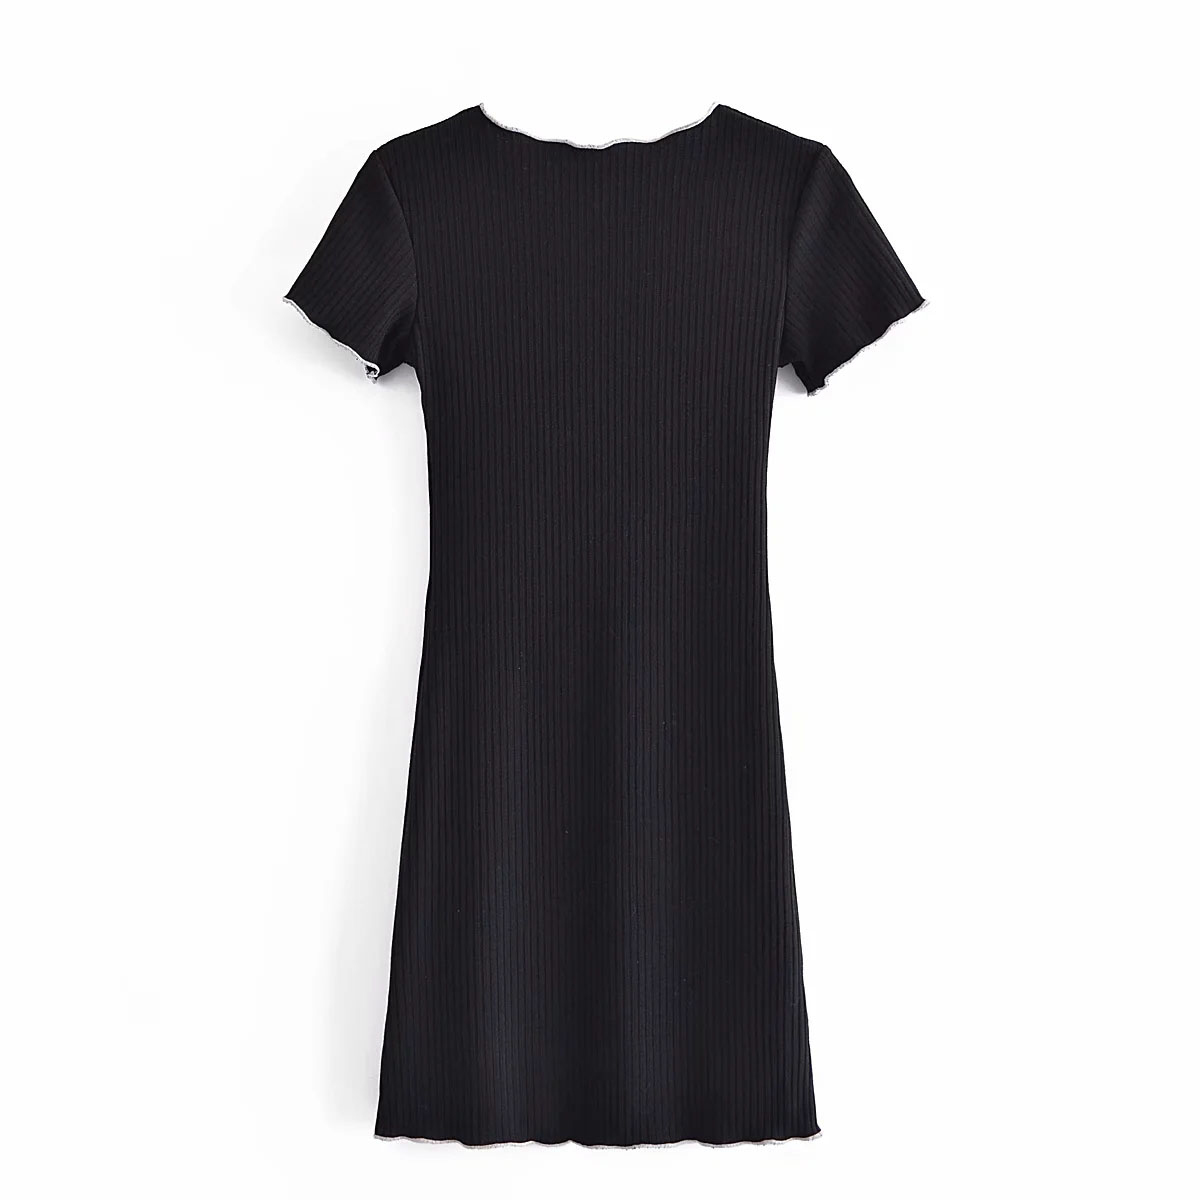 Sexy JewelNeck ShortSleeve Mini Bodycon Dresses DLQZ533